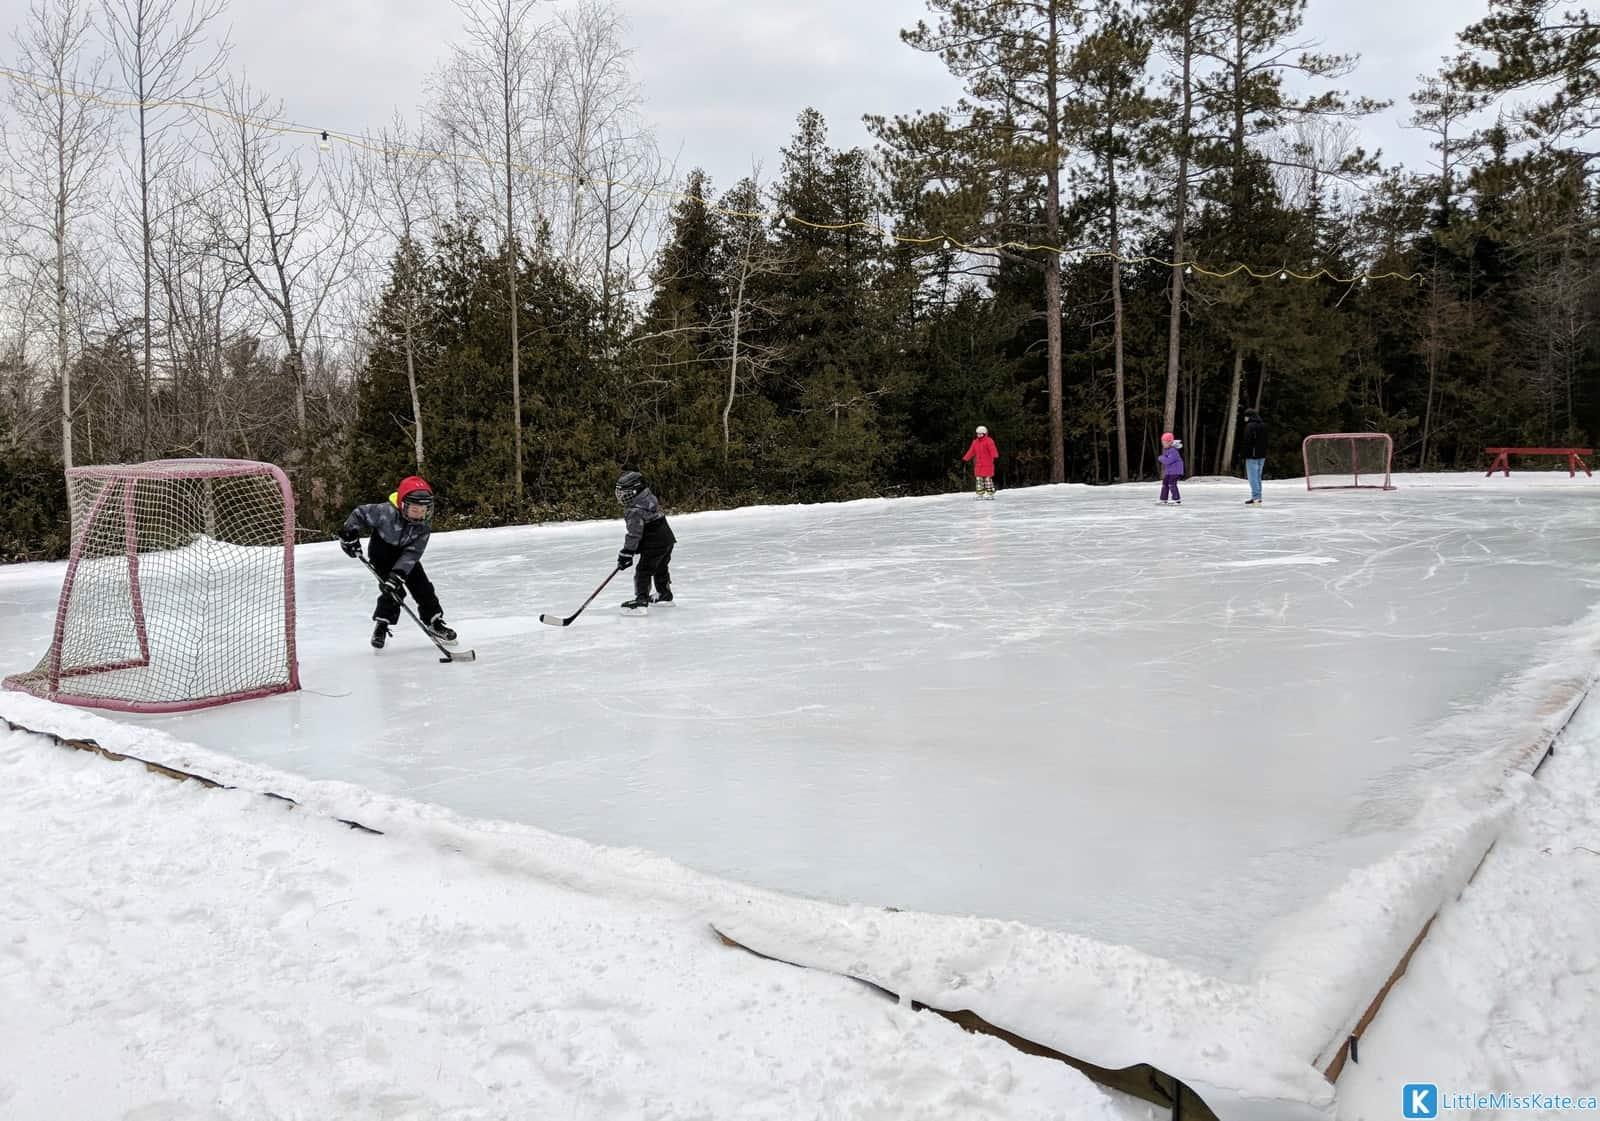 MacGregor Point winter camping activities ice pad outdoor hockey rink